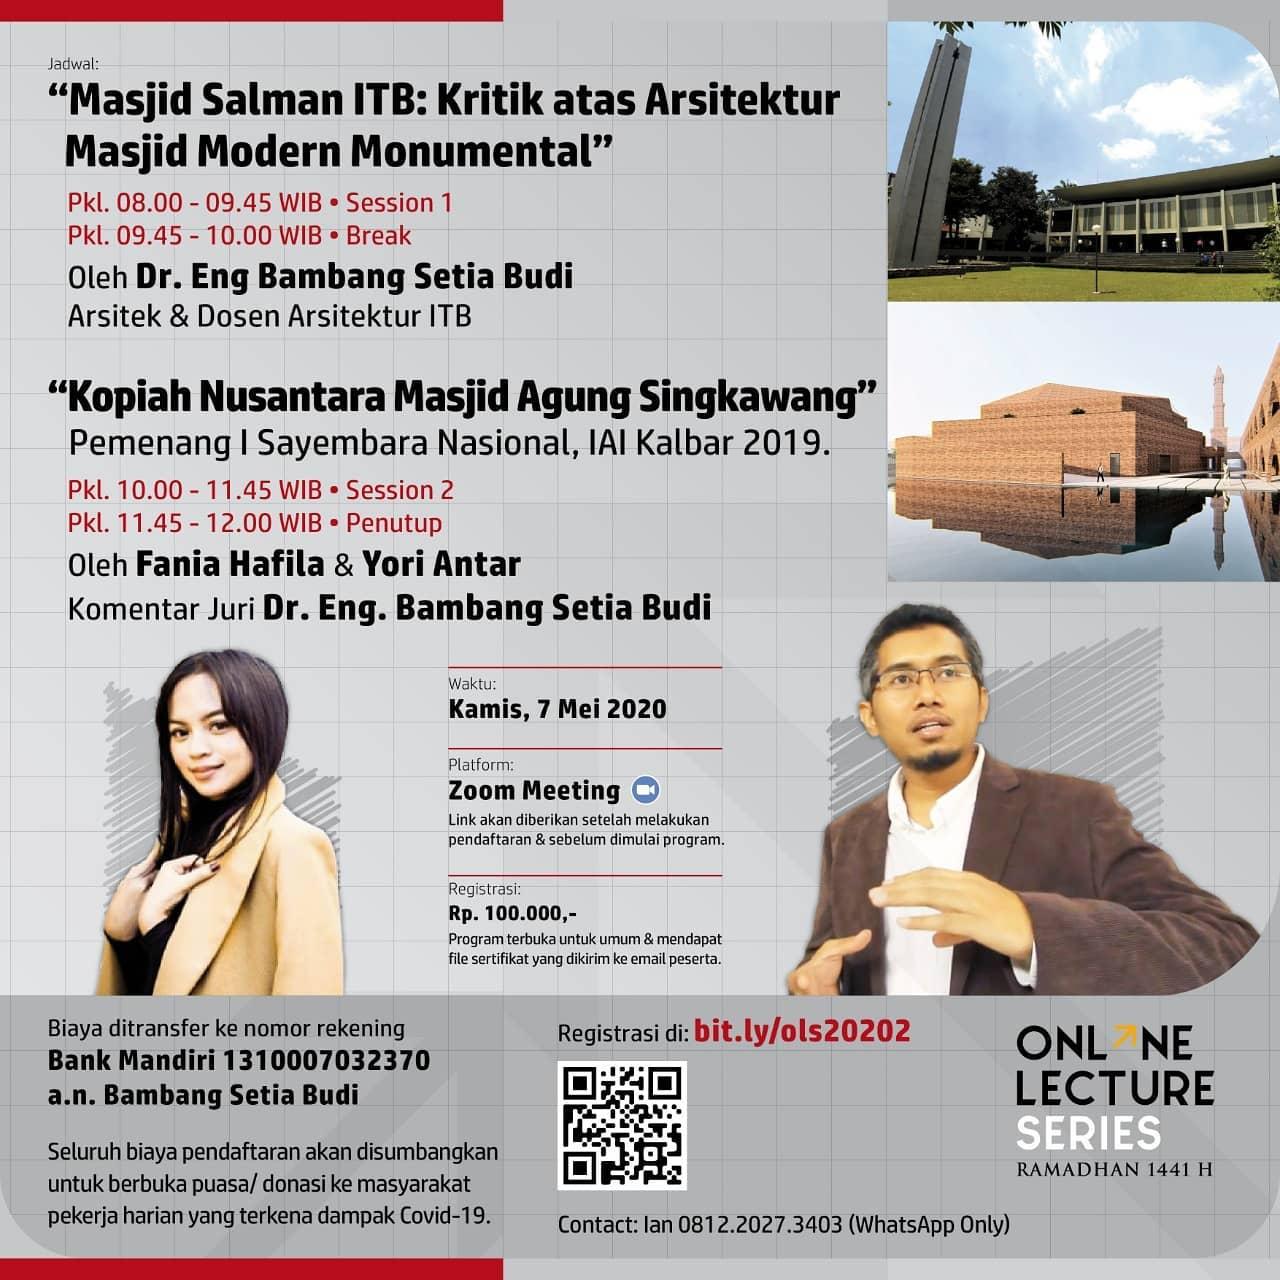 """Masjid Salman ITB: Kritik atas Arsitektur Masjid Modern Monumental"" oleh Bambang Setia Budi"